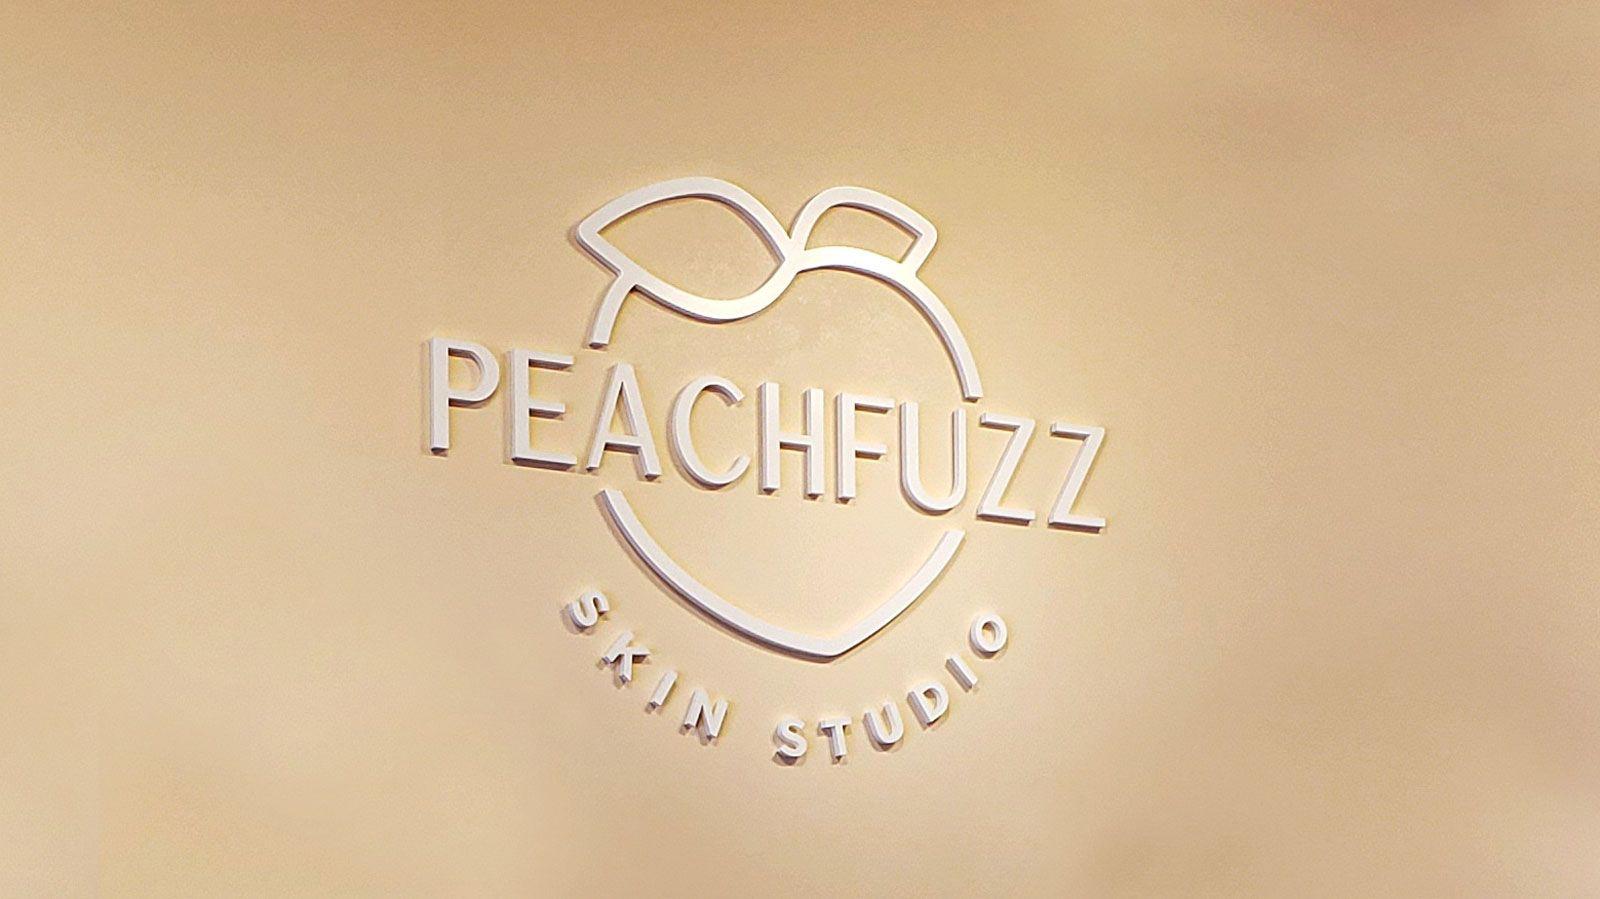 Peachfuzz 3D letters